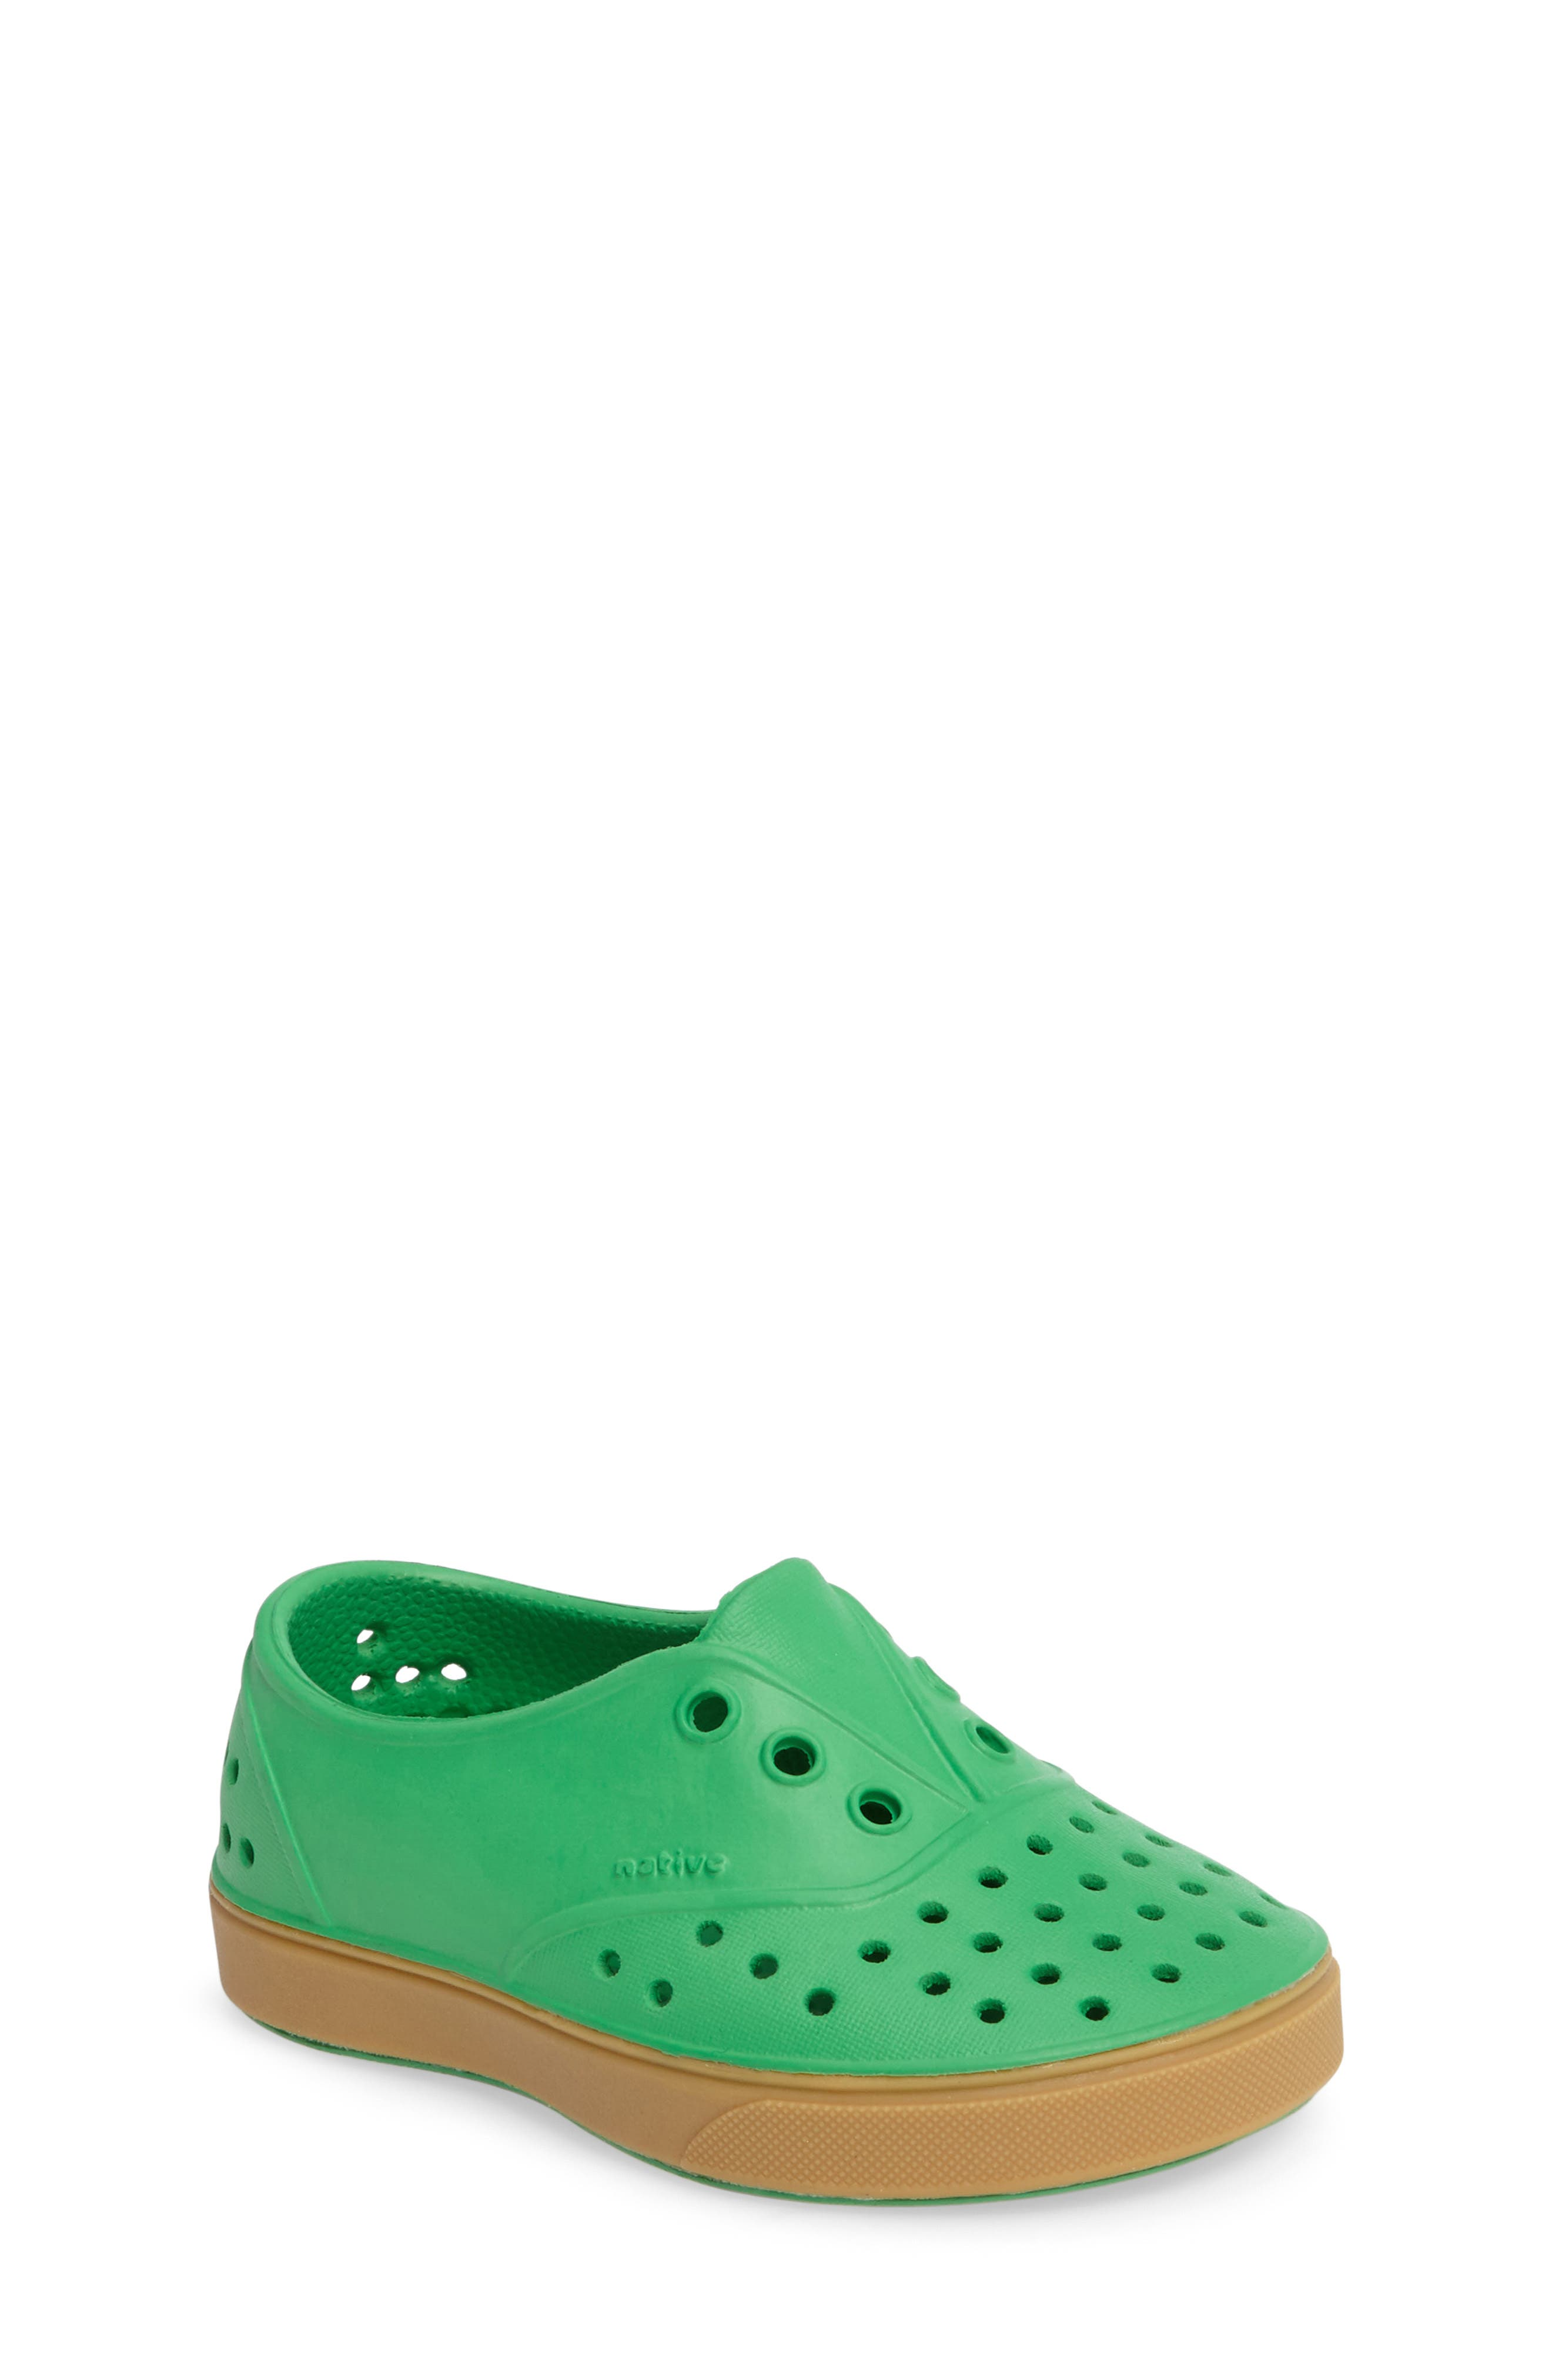 Miller Water Friendly Slip-On Sneaker,                             Main thumbnail 14, color,